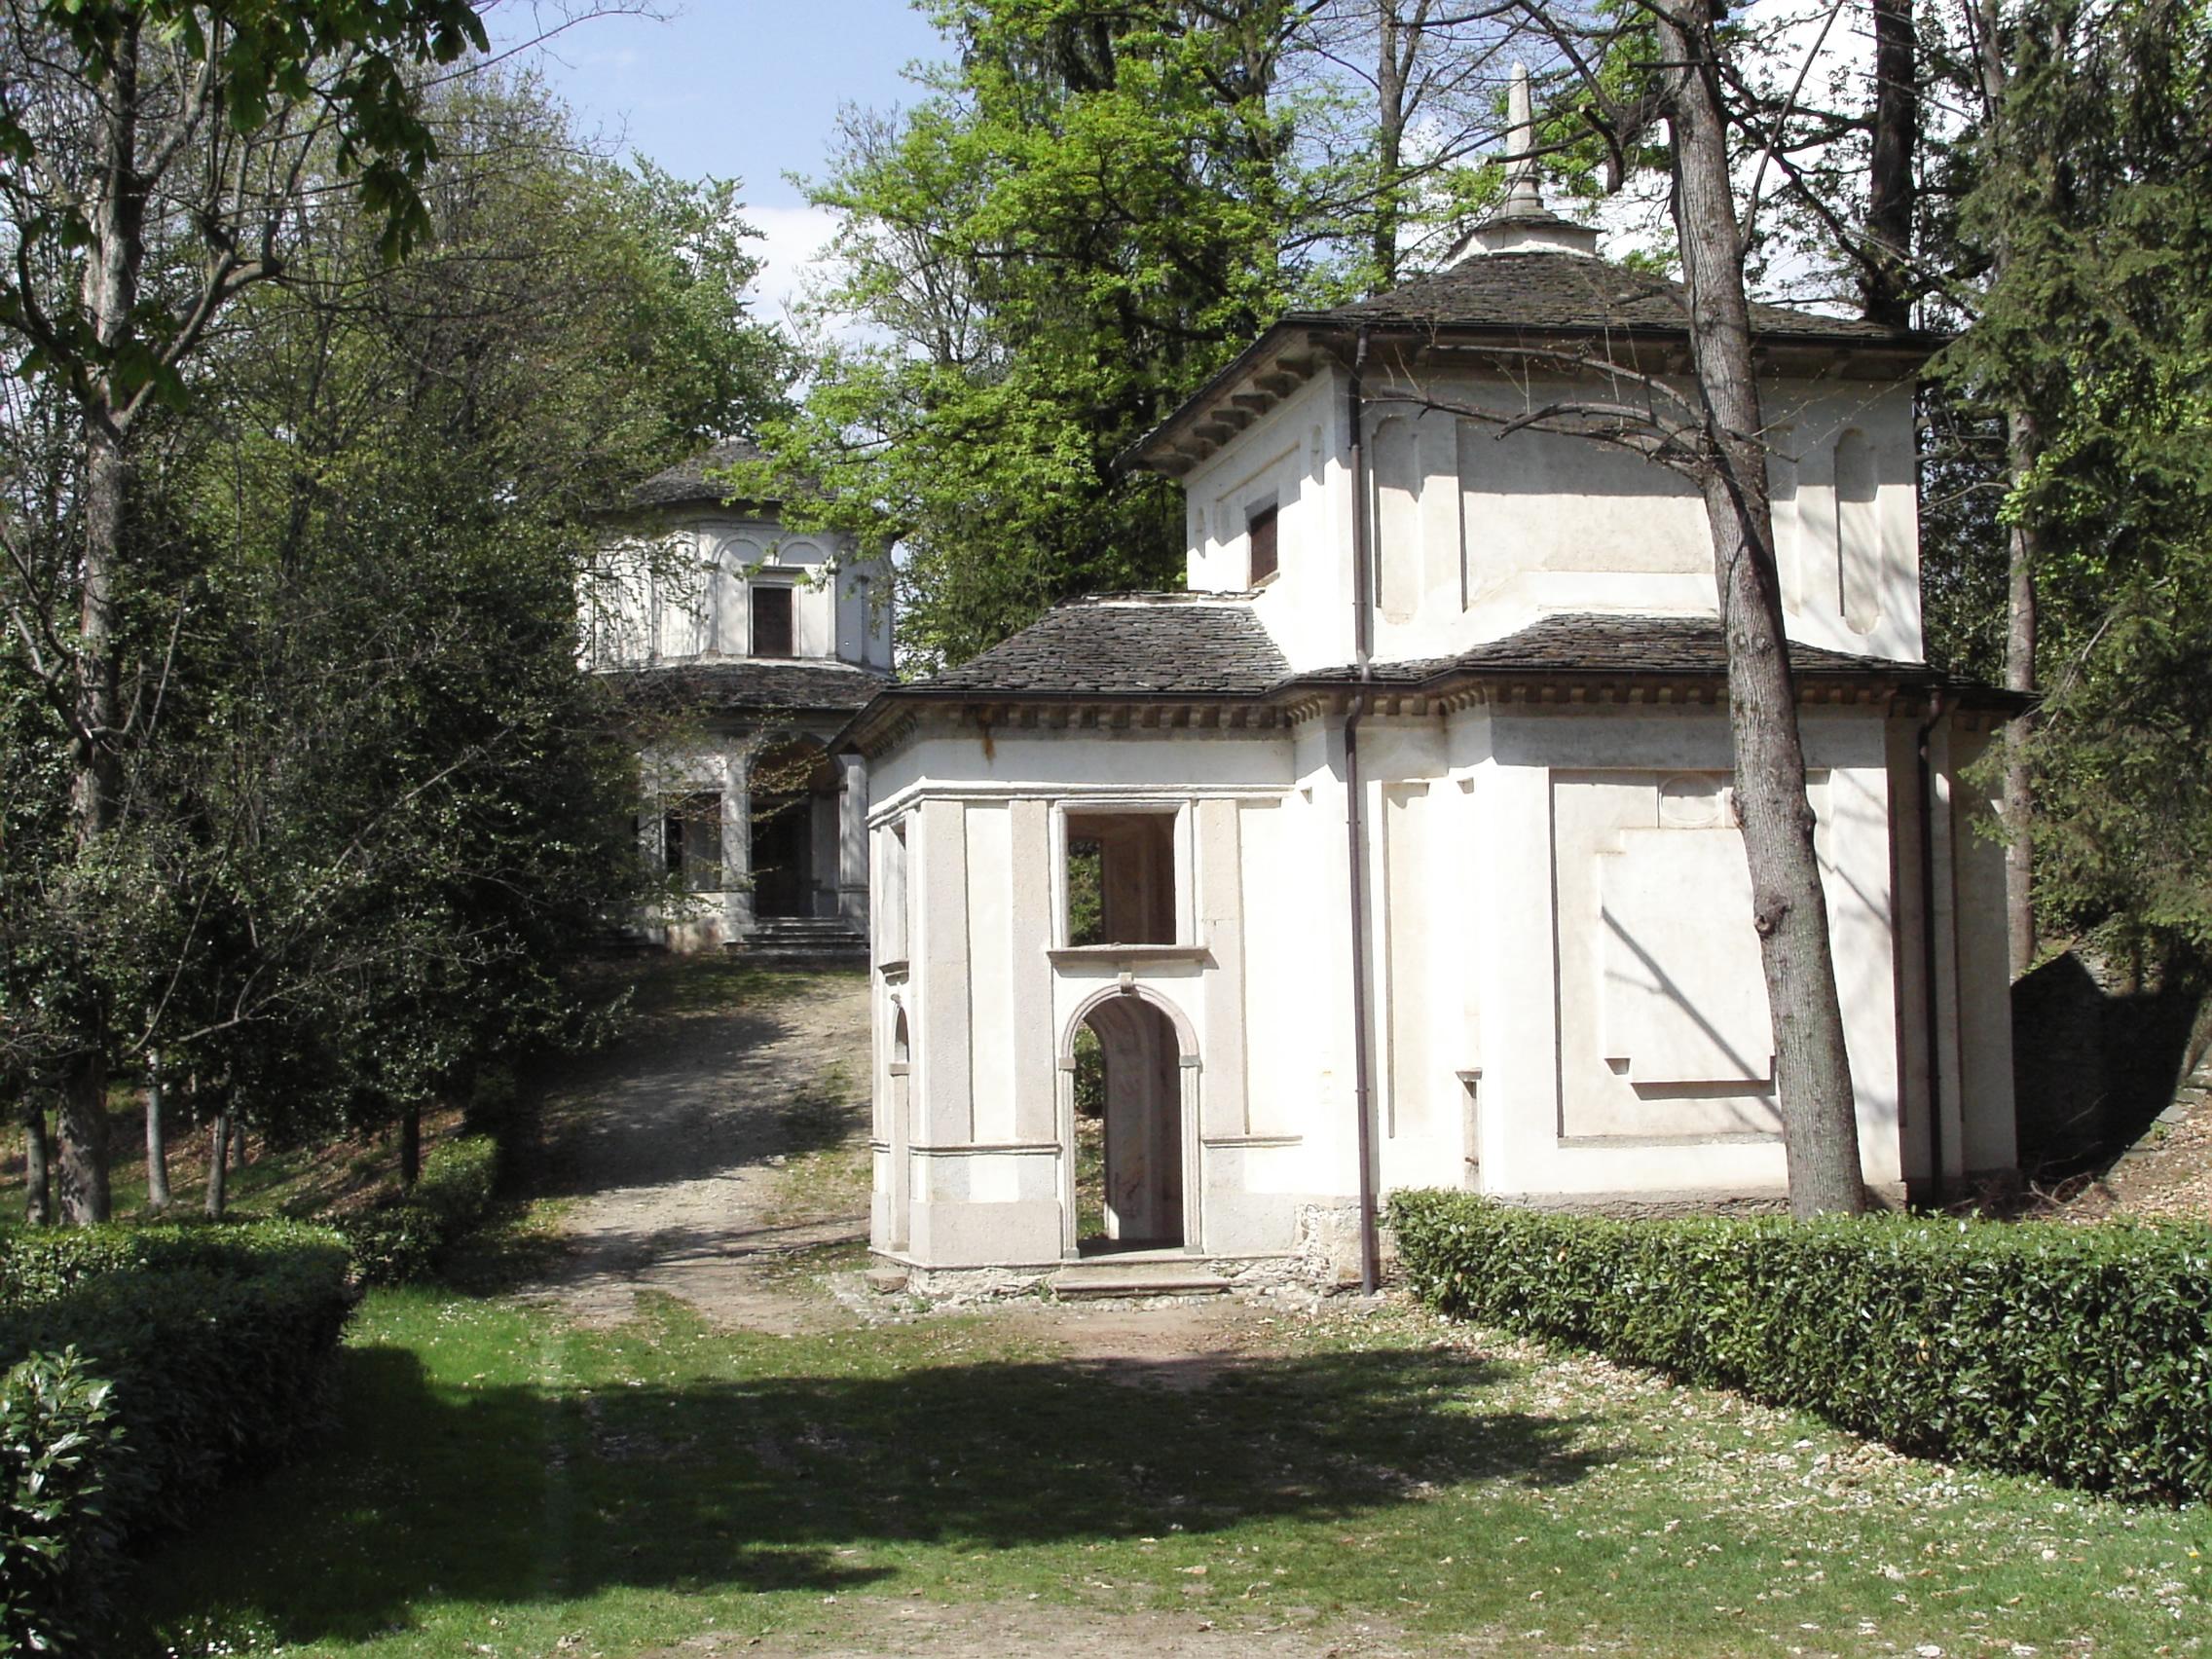 Orta – Sacro Monte (9)